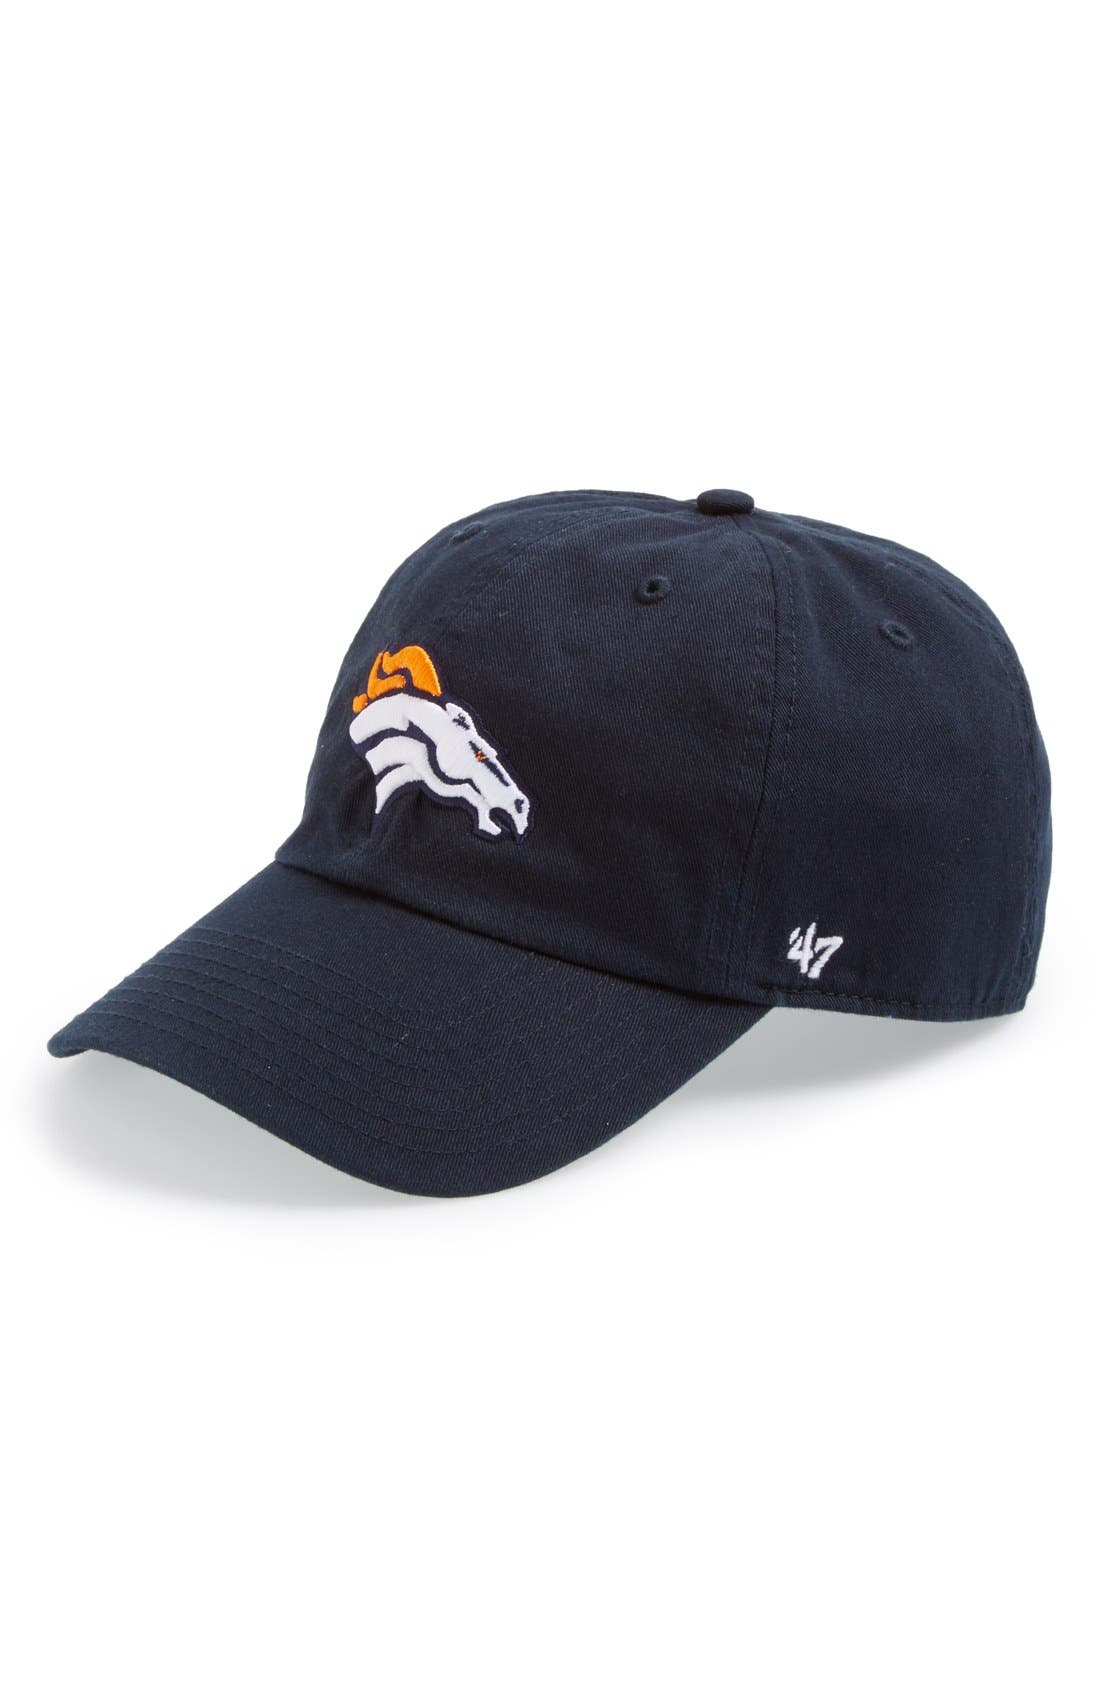 Main Image - '47 'Denver Broncos - Clean Up' Cap